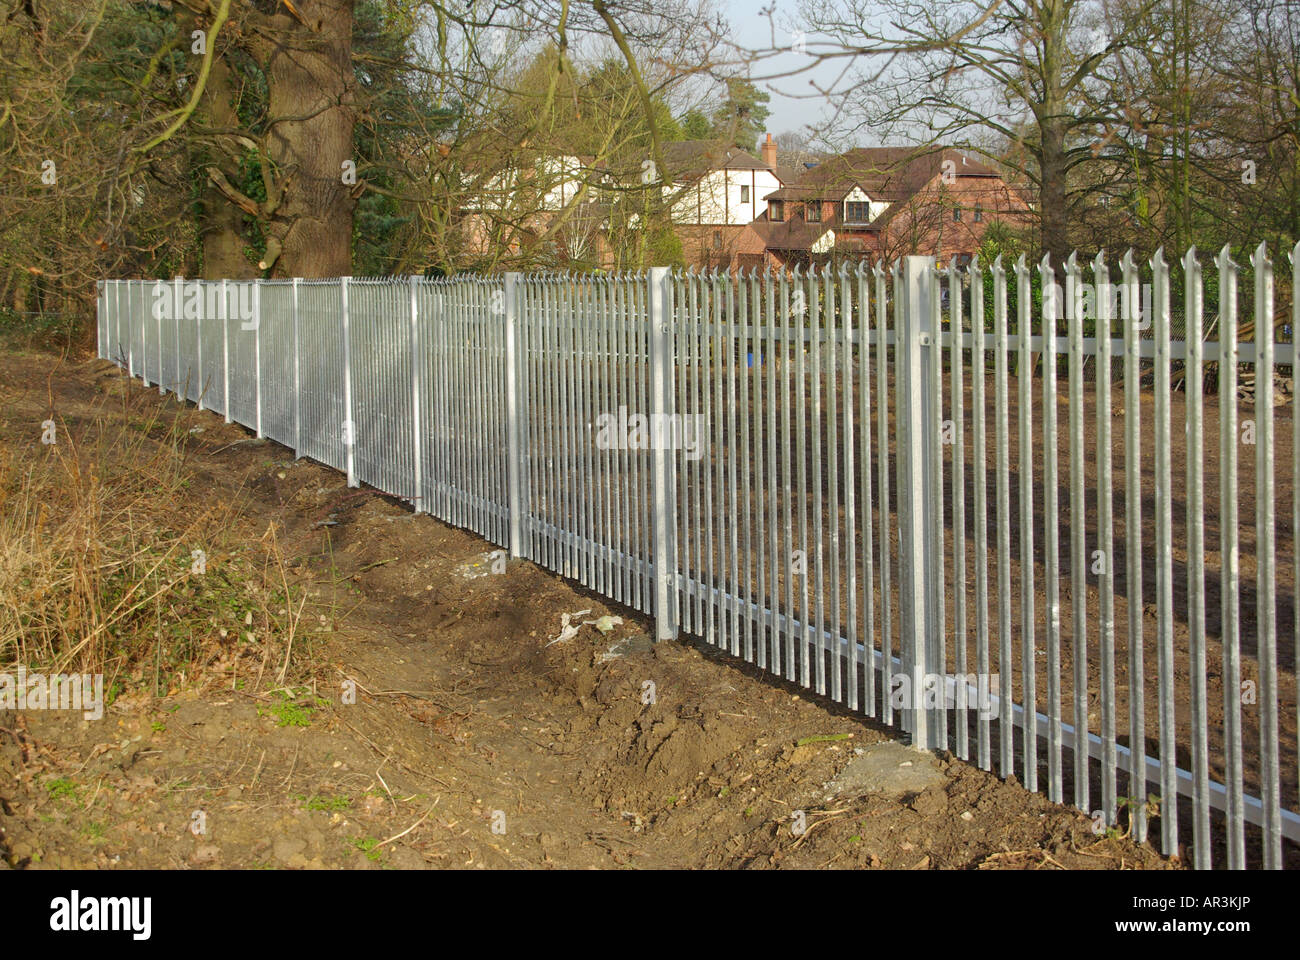 Concrete fencing post stock photos concrete fencing post stock galvanised steel palisade fence panels around paddock stock image baanklon Images